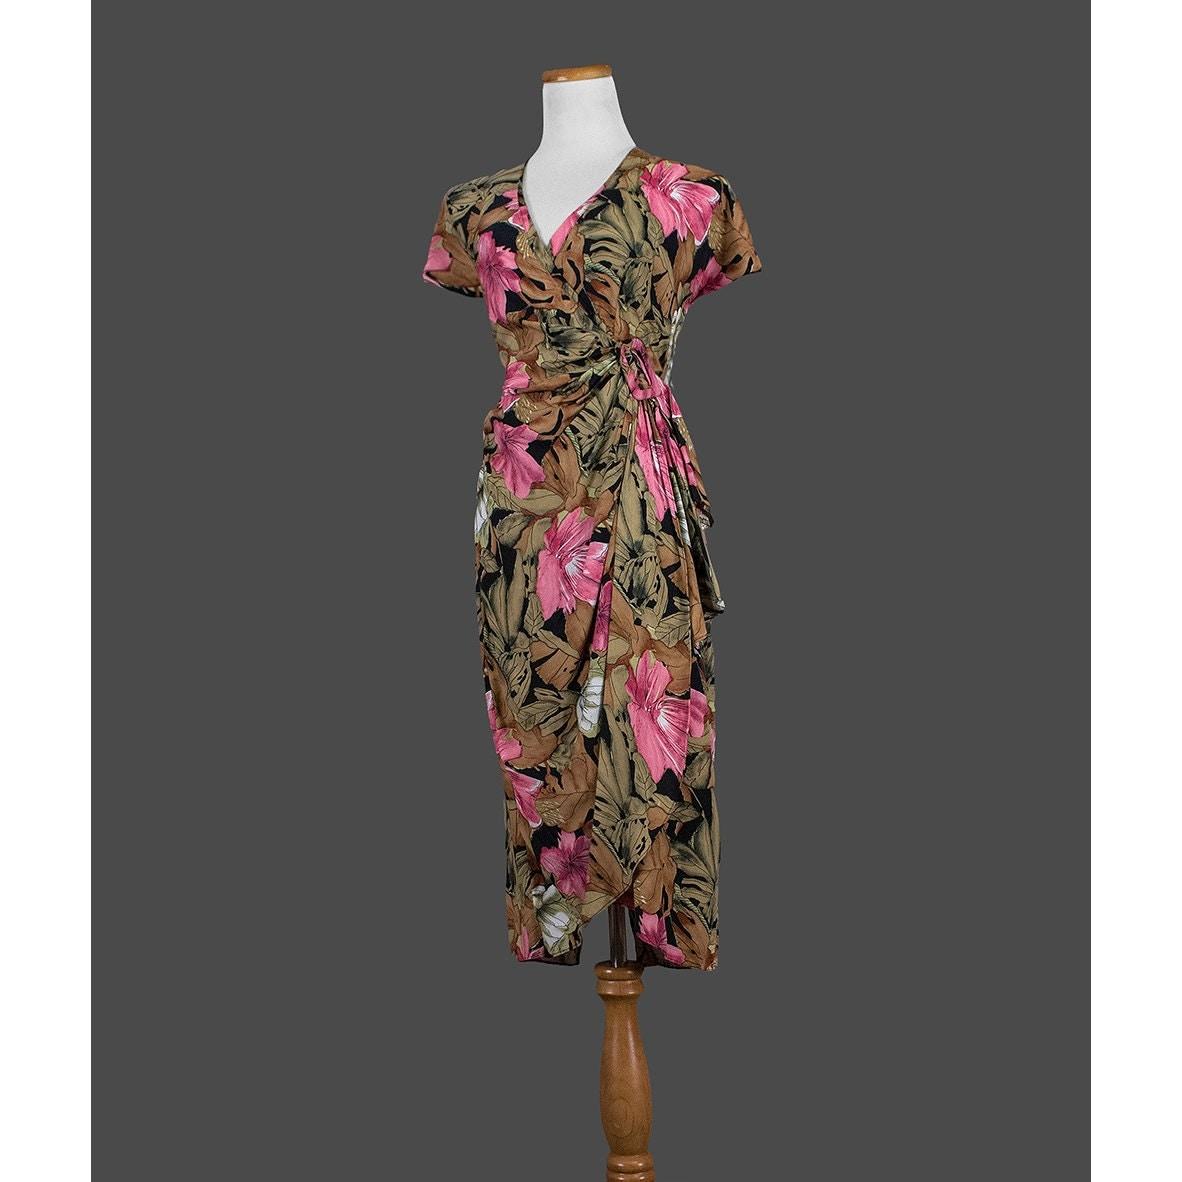 Sale vintage 1980s hawaiian dress 80s tropical by for Hawaiian wedding dresses with sleeves